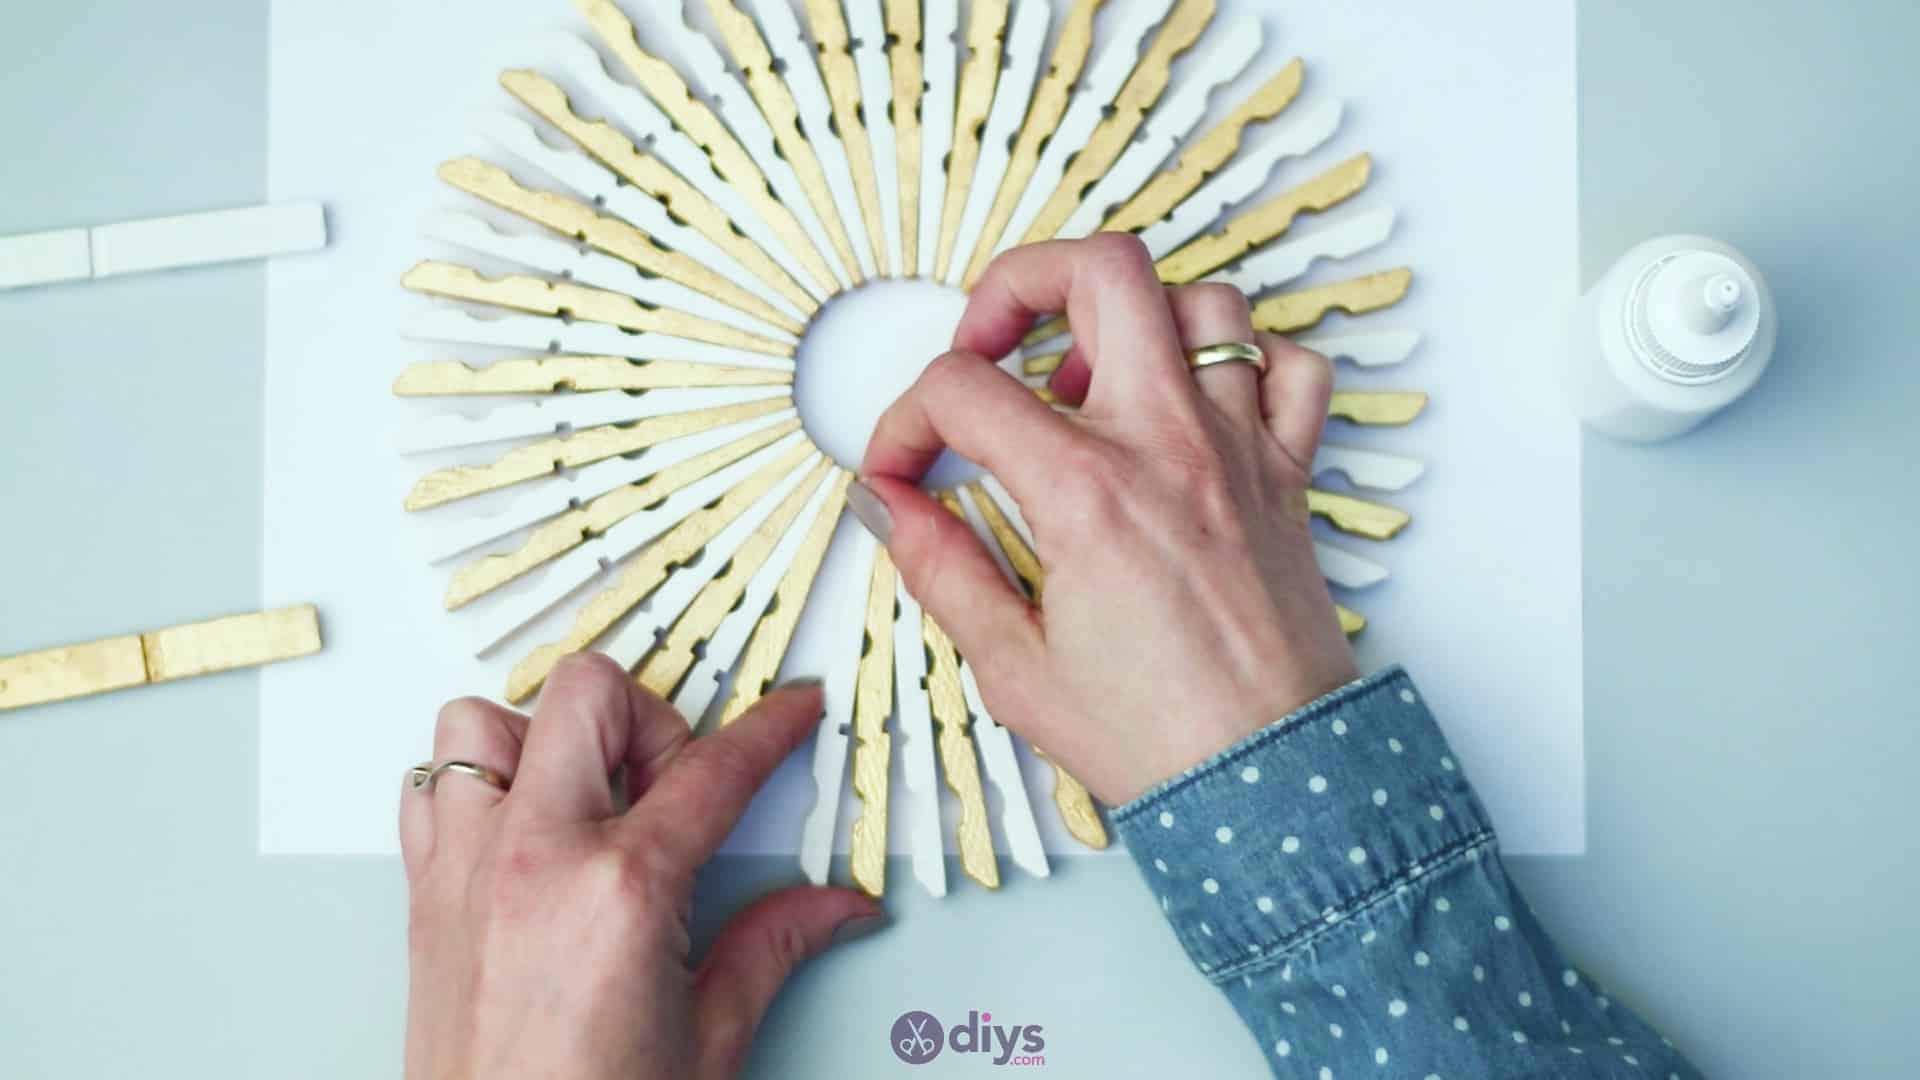 Diy clothespin art step 5m